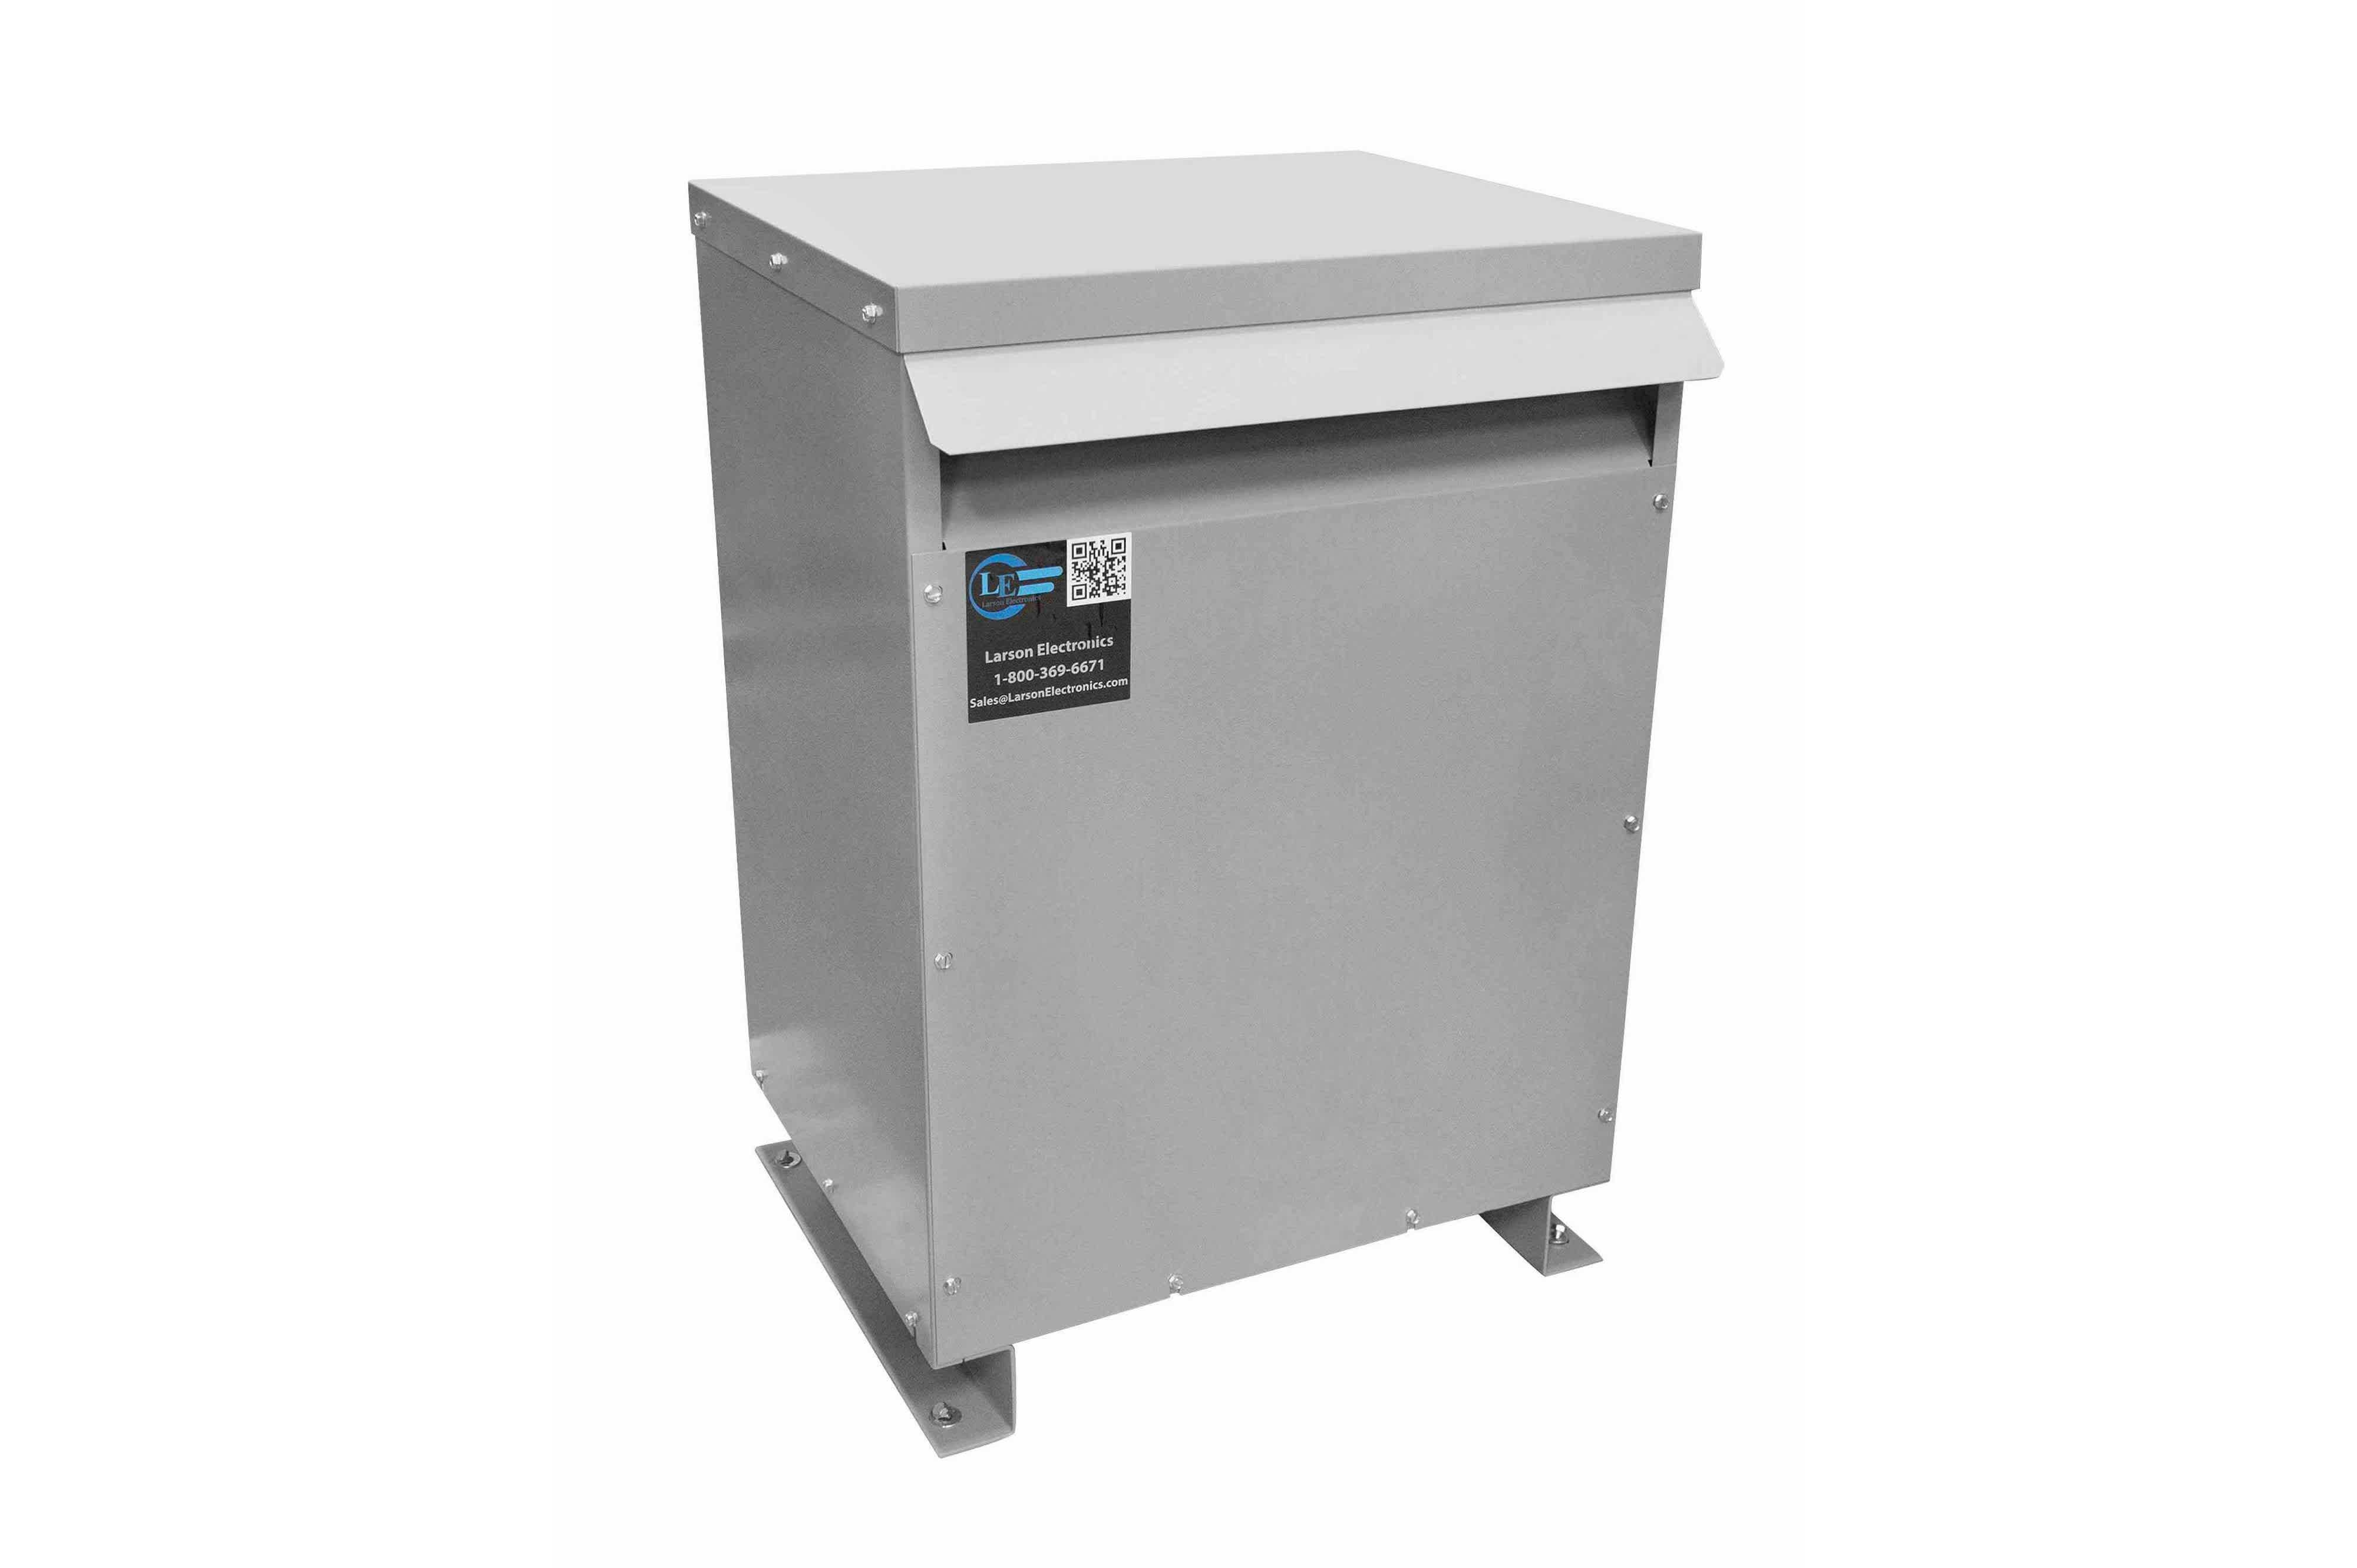 750 kVA 3PH DOE Transformer, 480V Delta Primary, 575Y/332 Wye-N Secondary, N3R, Ventilated, 60 Hz